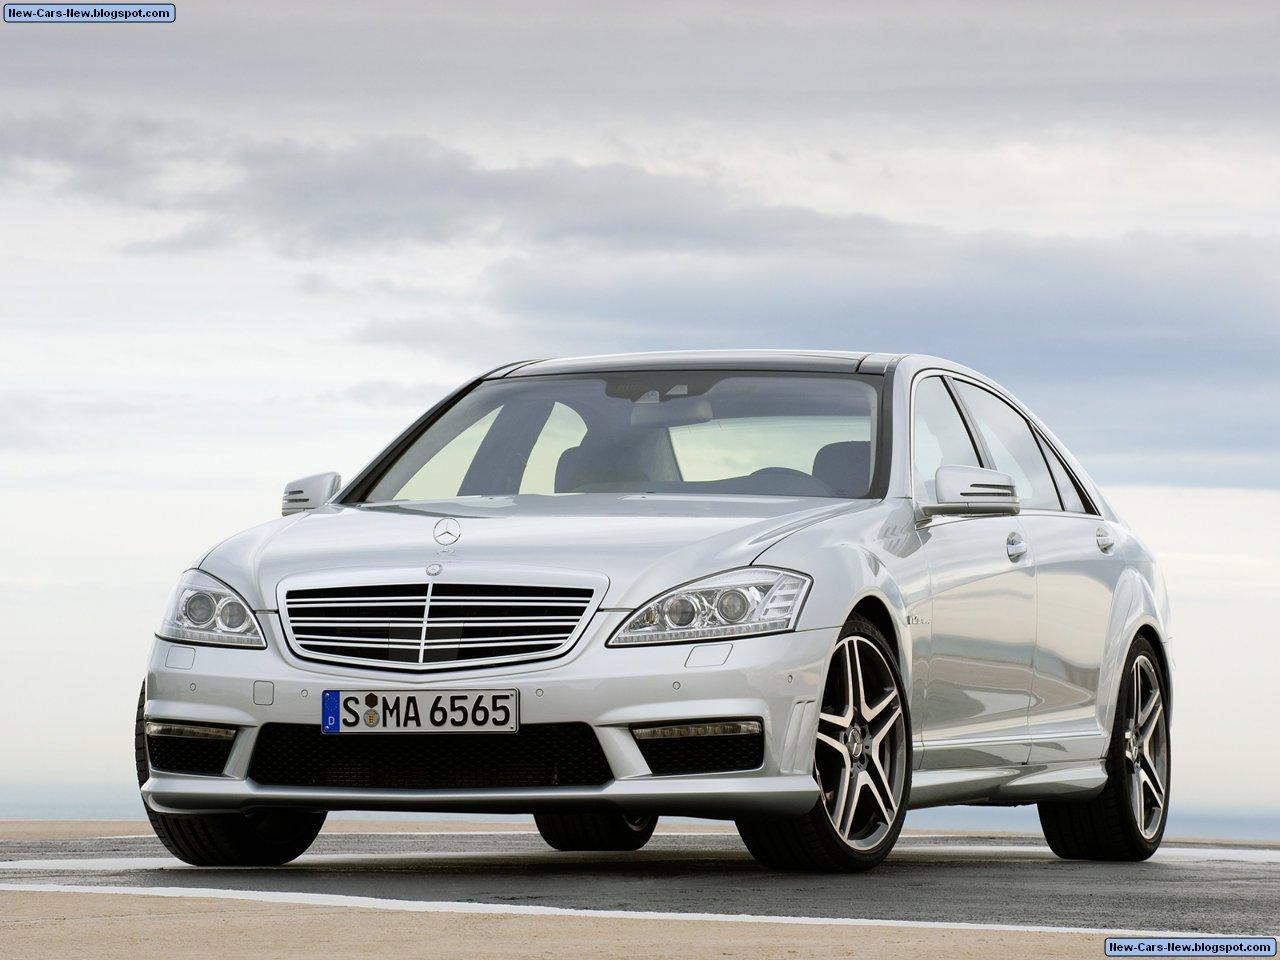 http://1.bp.blogspot.com/_U4w592tUDHM/TB8W-M132II/AAAAAAAABS8/C8l8yvDysyw/s1600/Mercedes-Benz+S65_AMG_2010_1280x960_wallpaper_01.jpg